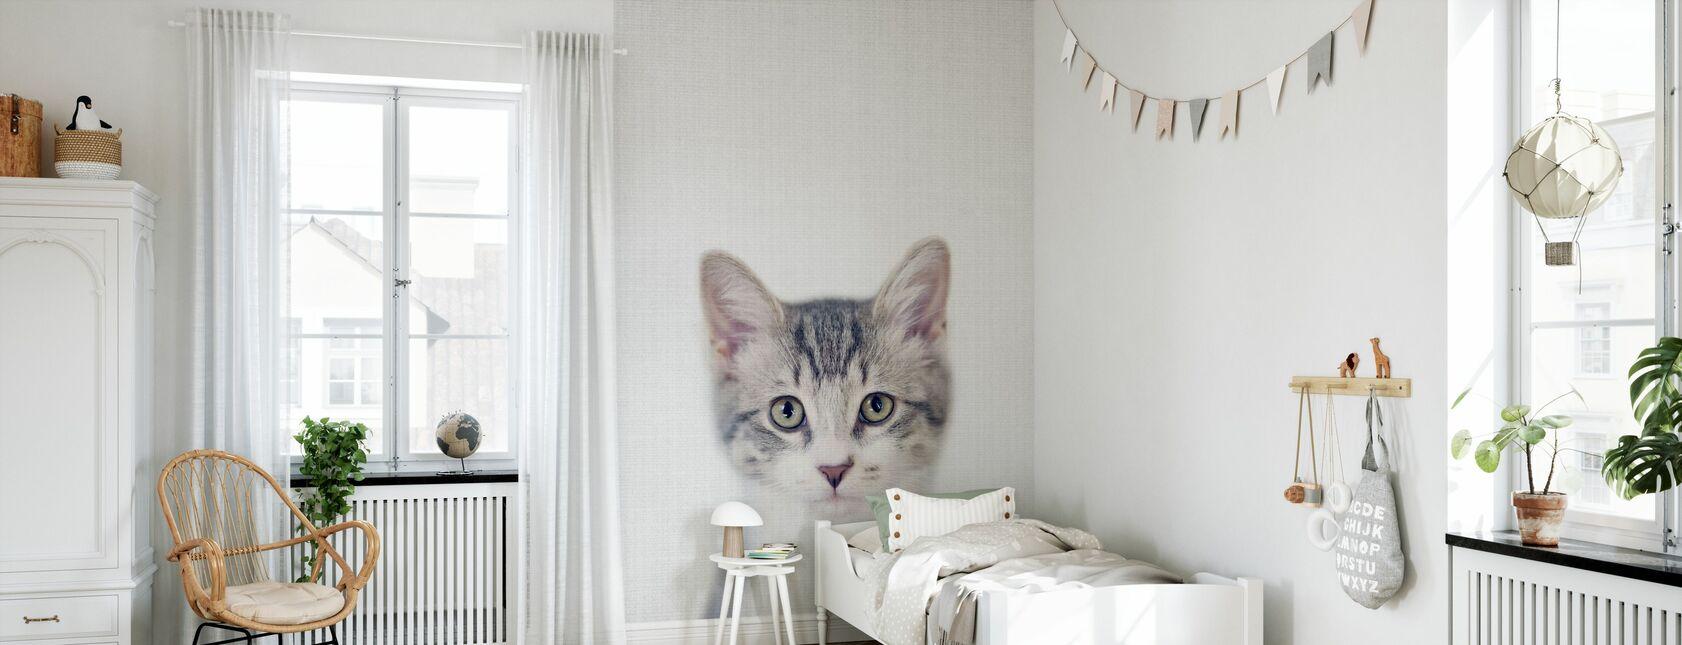 Kitten - Wallpaper - Kids Room